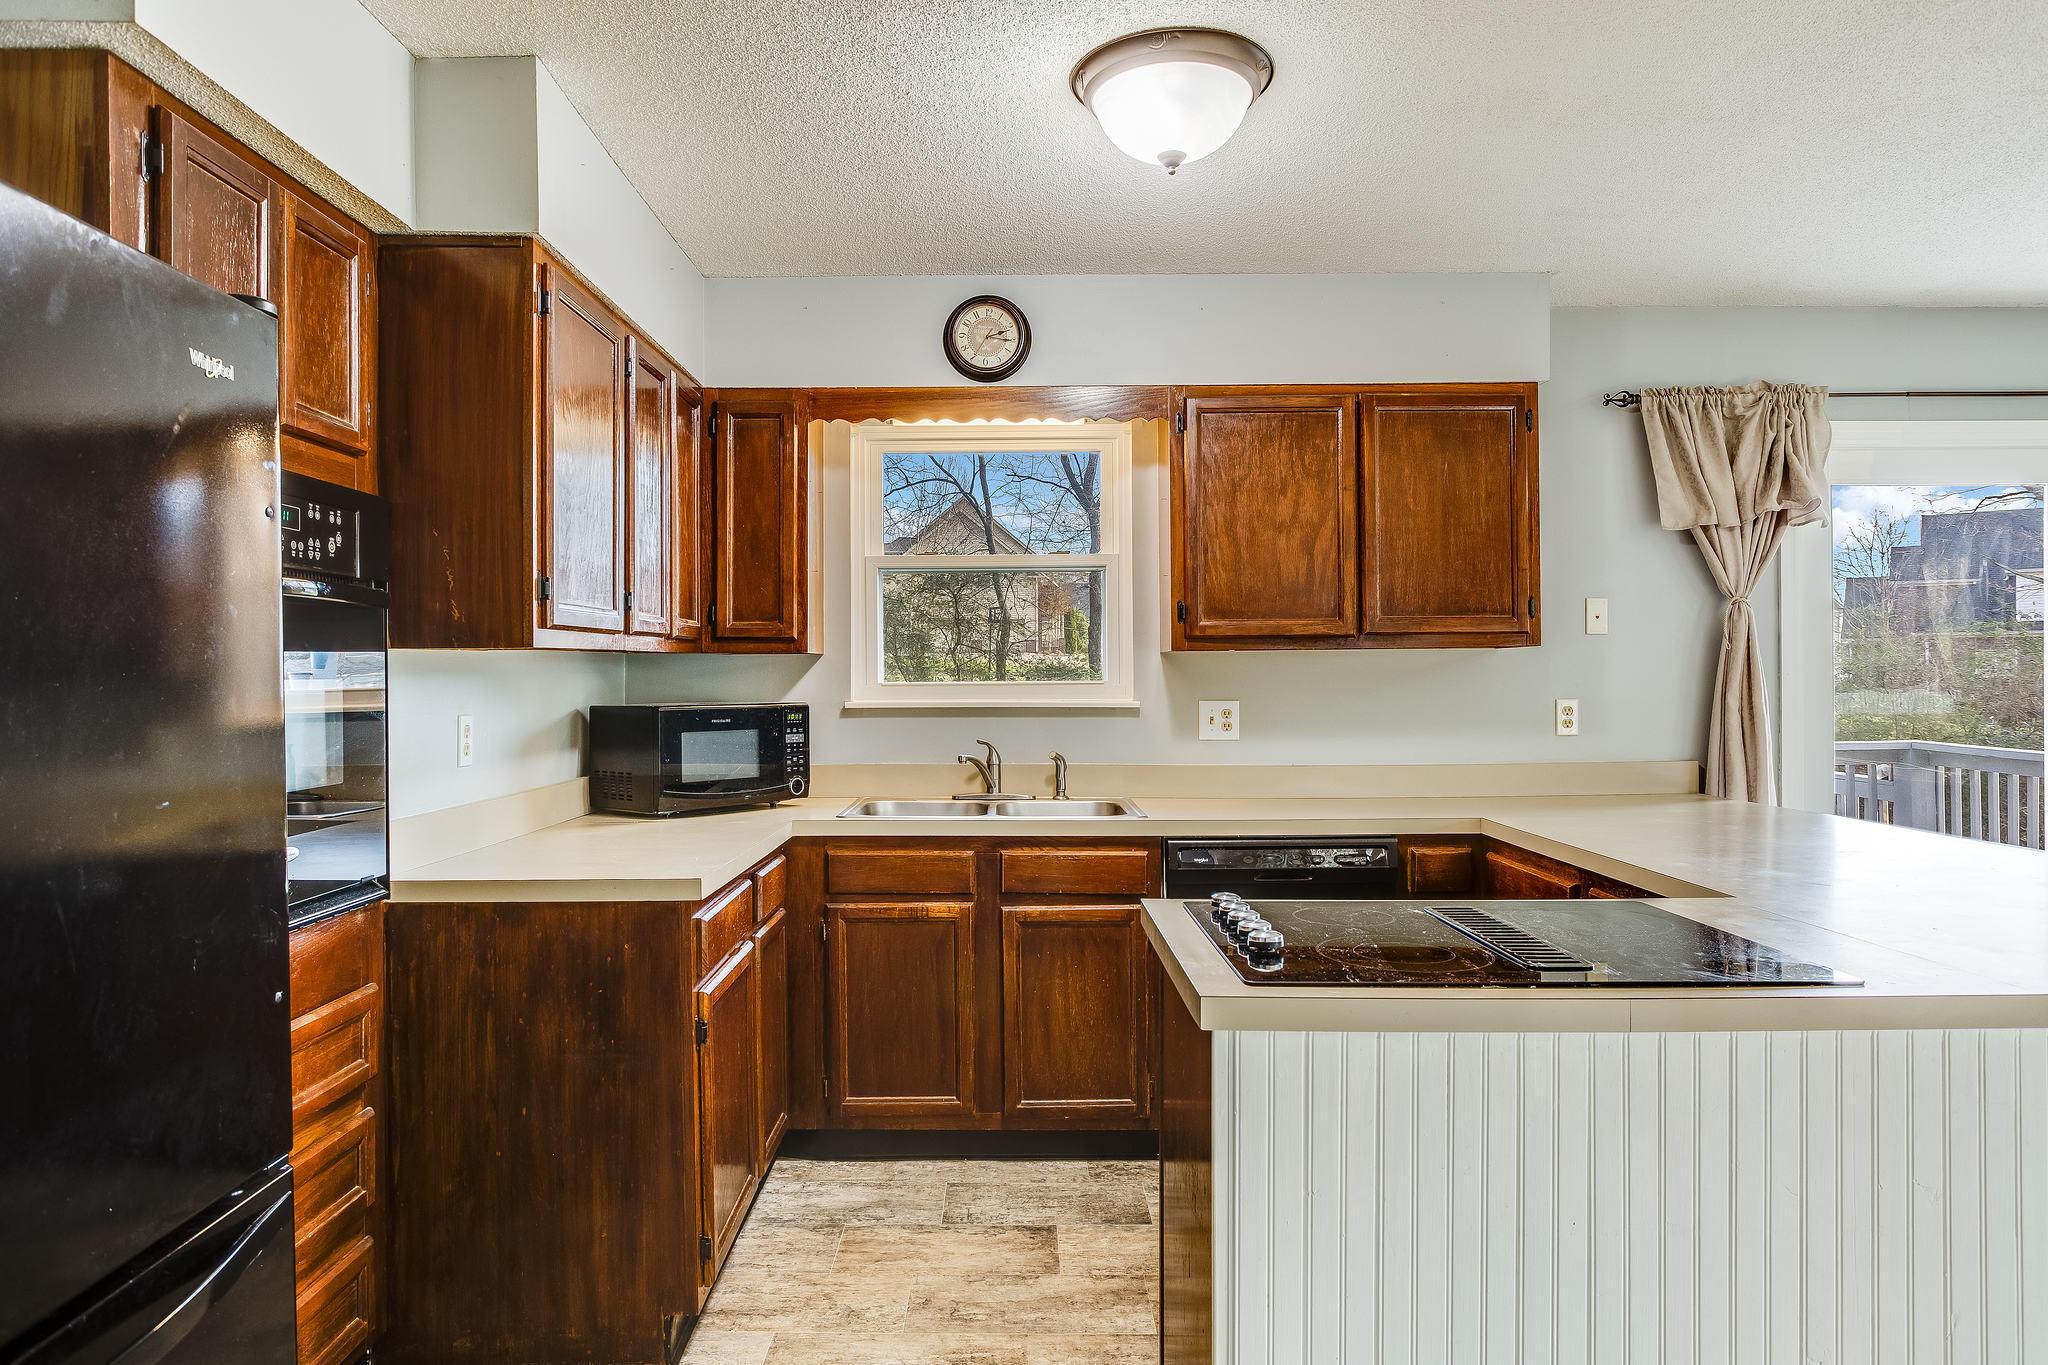 504 Bobolink Rd kitchen (2)